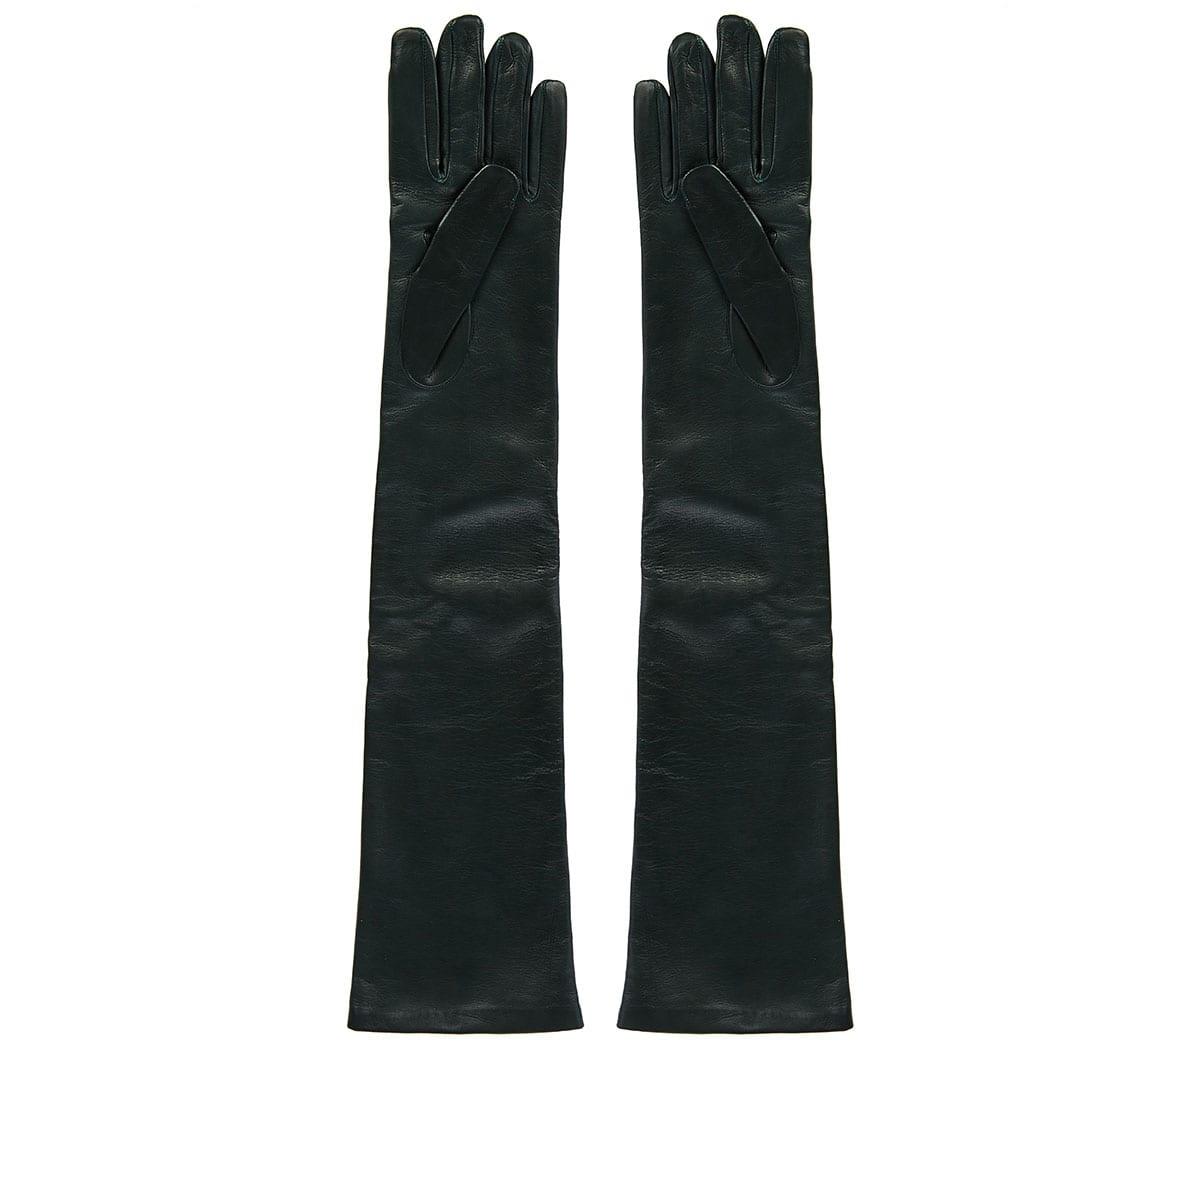 VLOGO long leather gloves